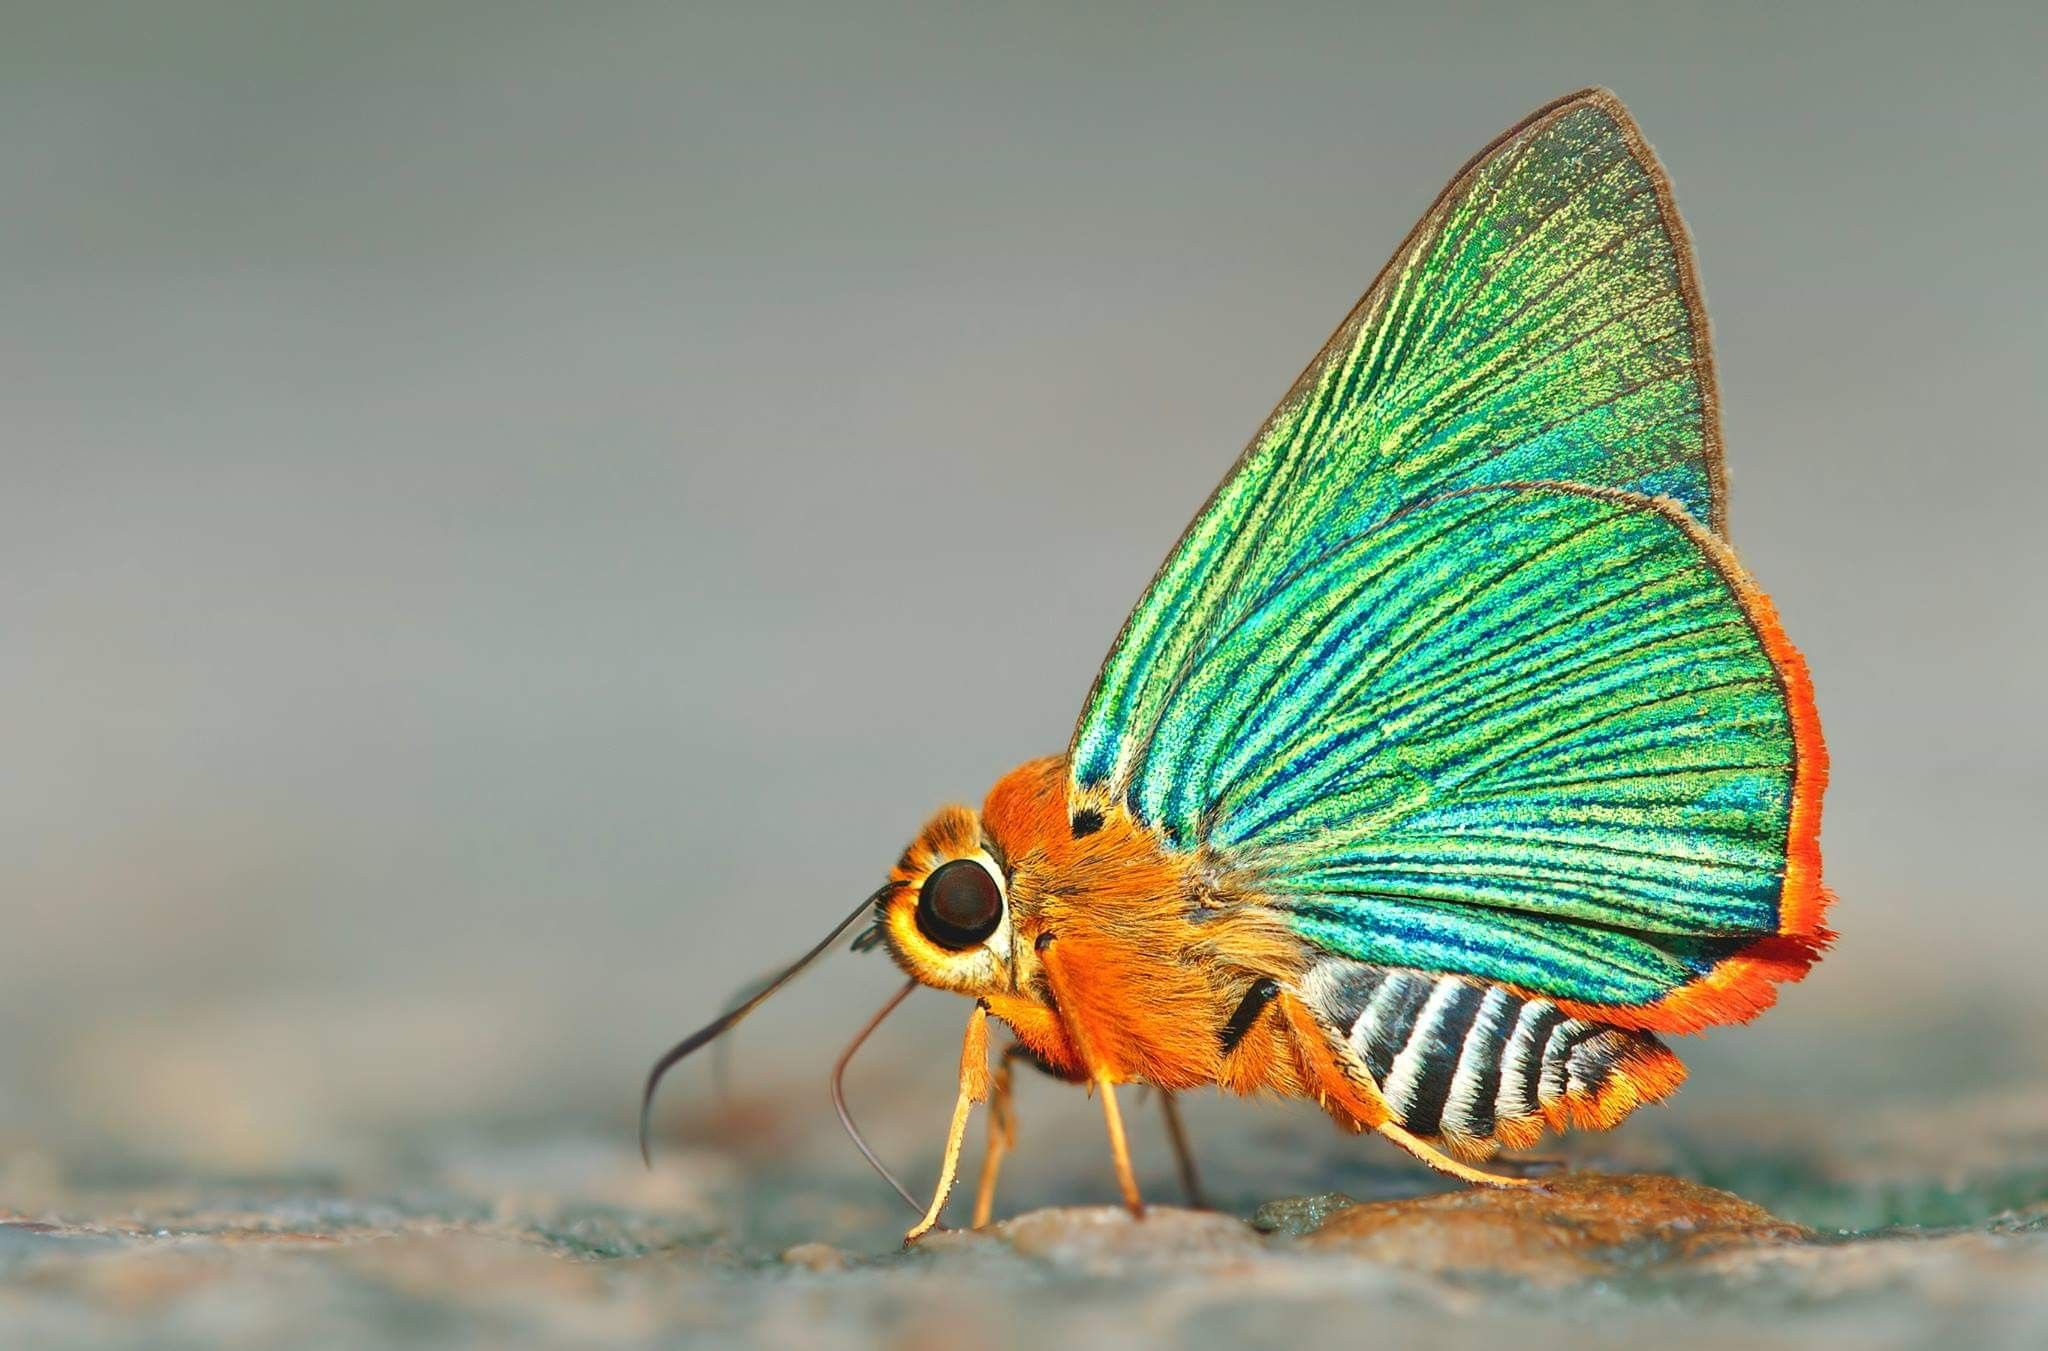 Pin By Weiden Feder On Butterflies Moths Butterfly Photos Dragonfly Insect Beautiful Butterflies